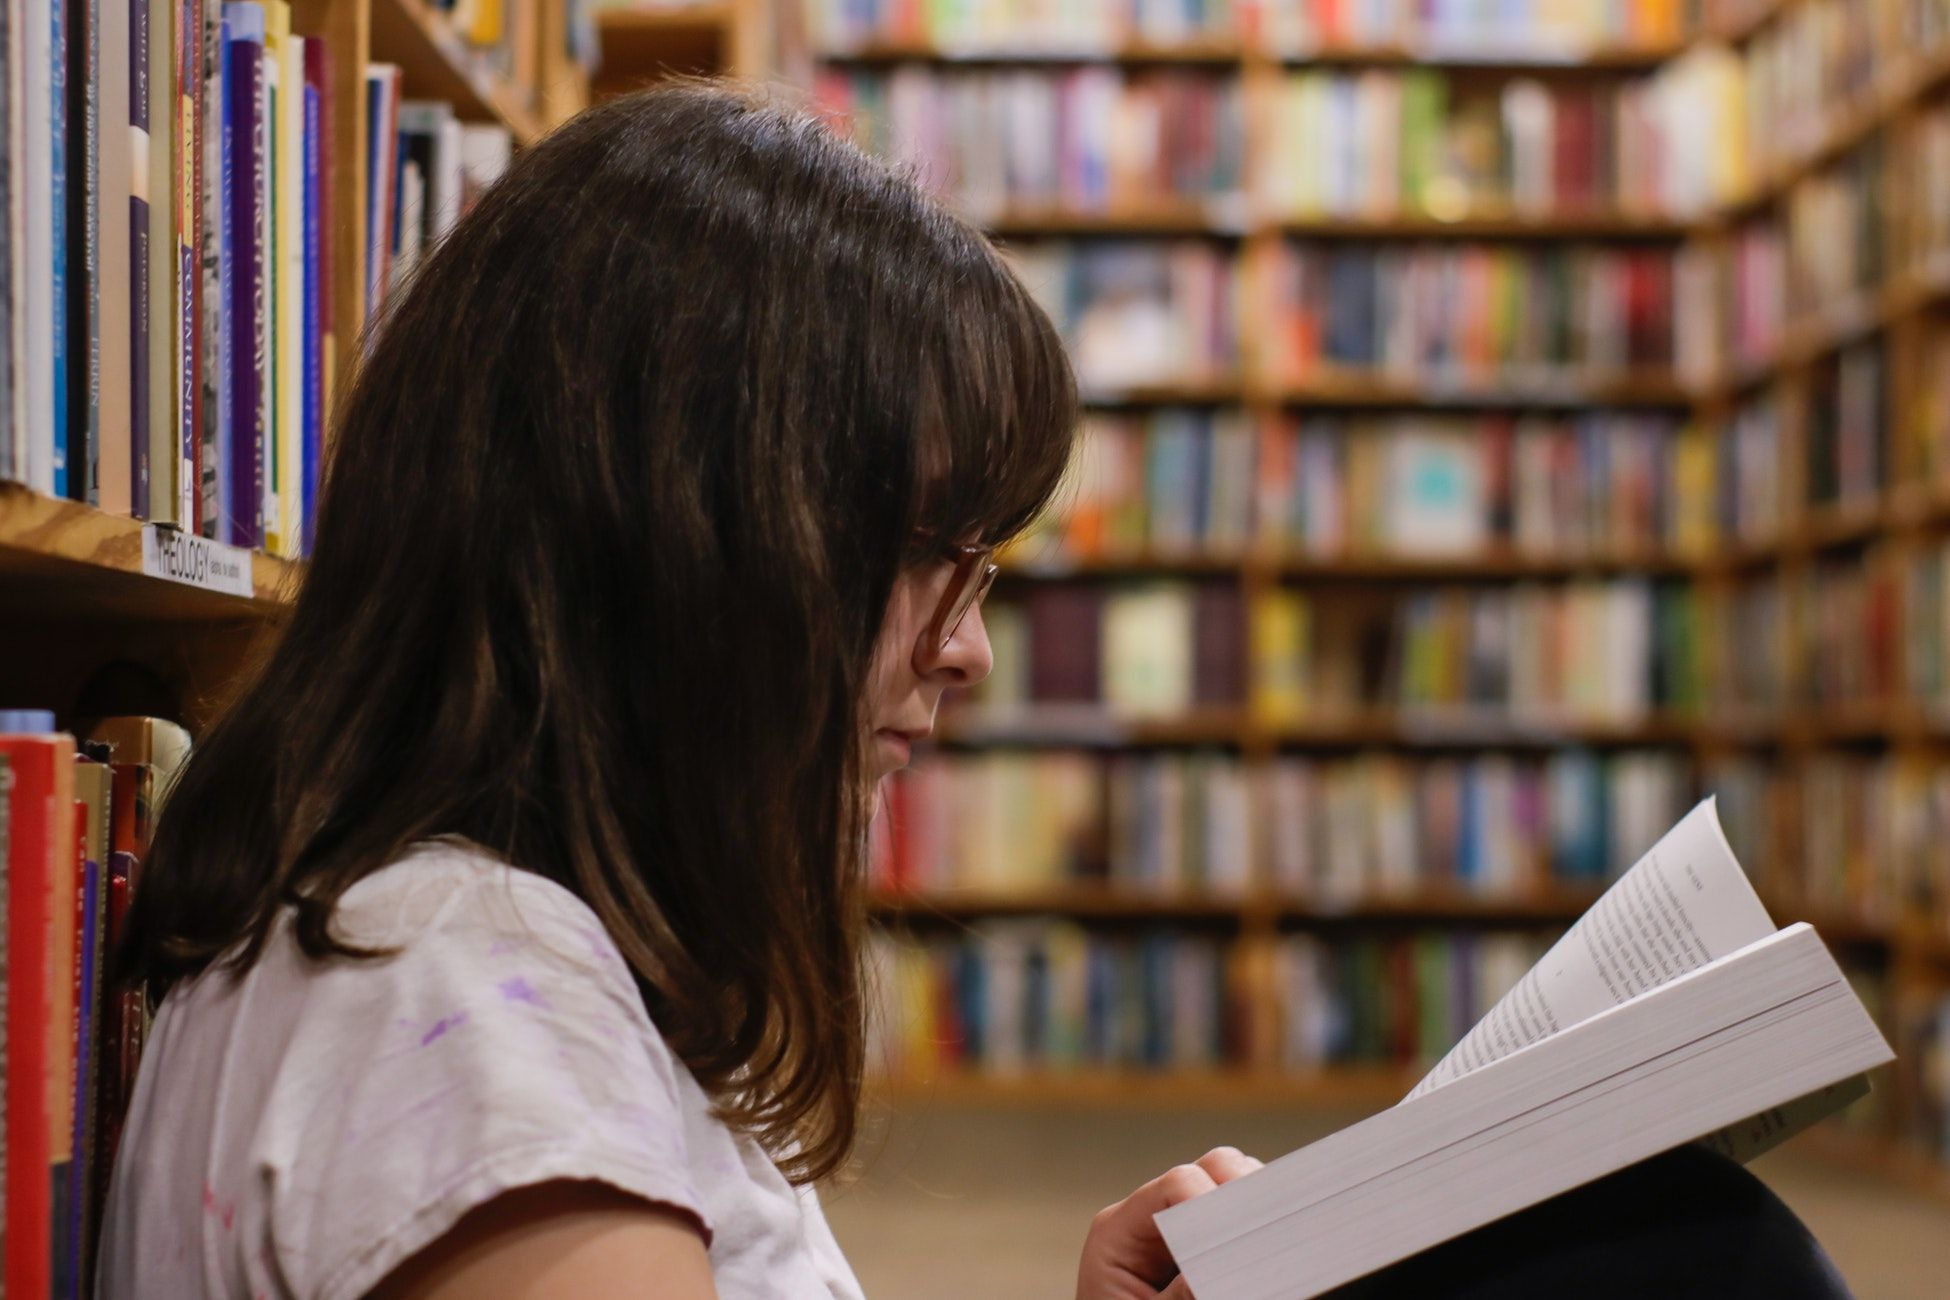 magellan-orientation-scolaire-etudiante-bibliothèque